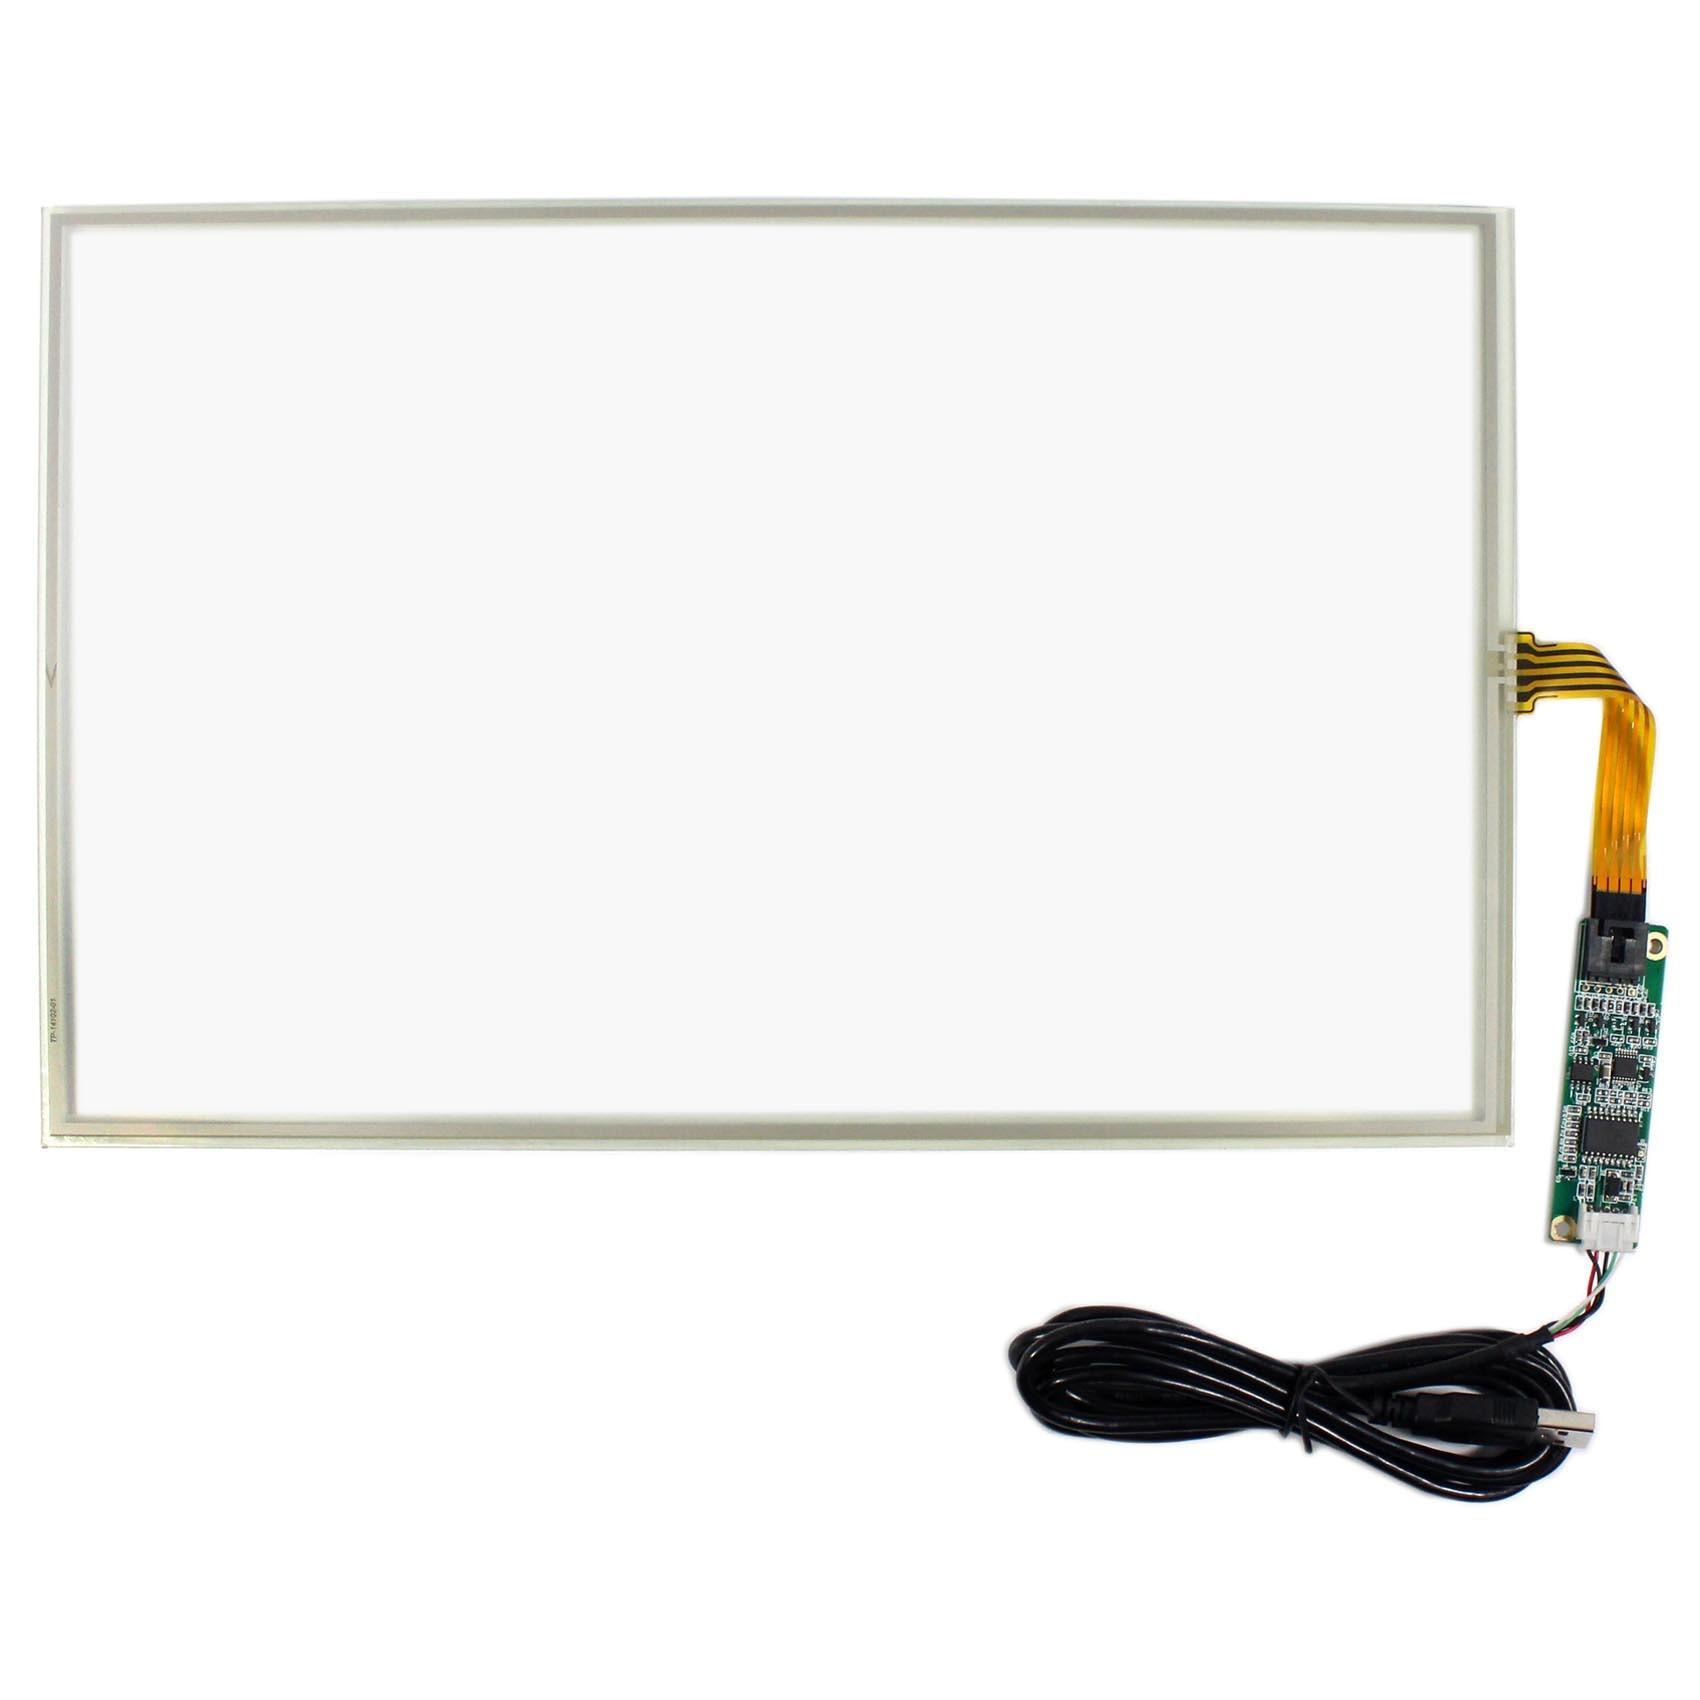 pmac controller card